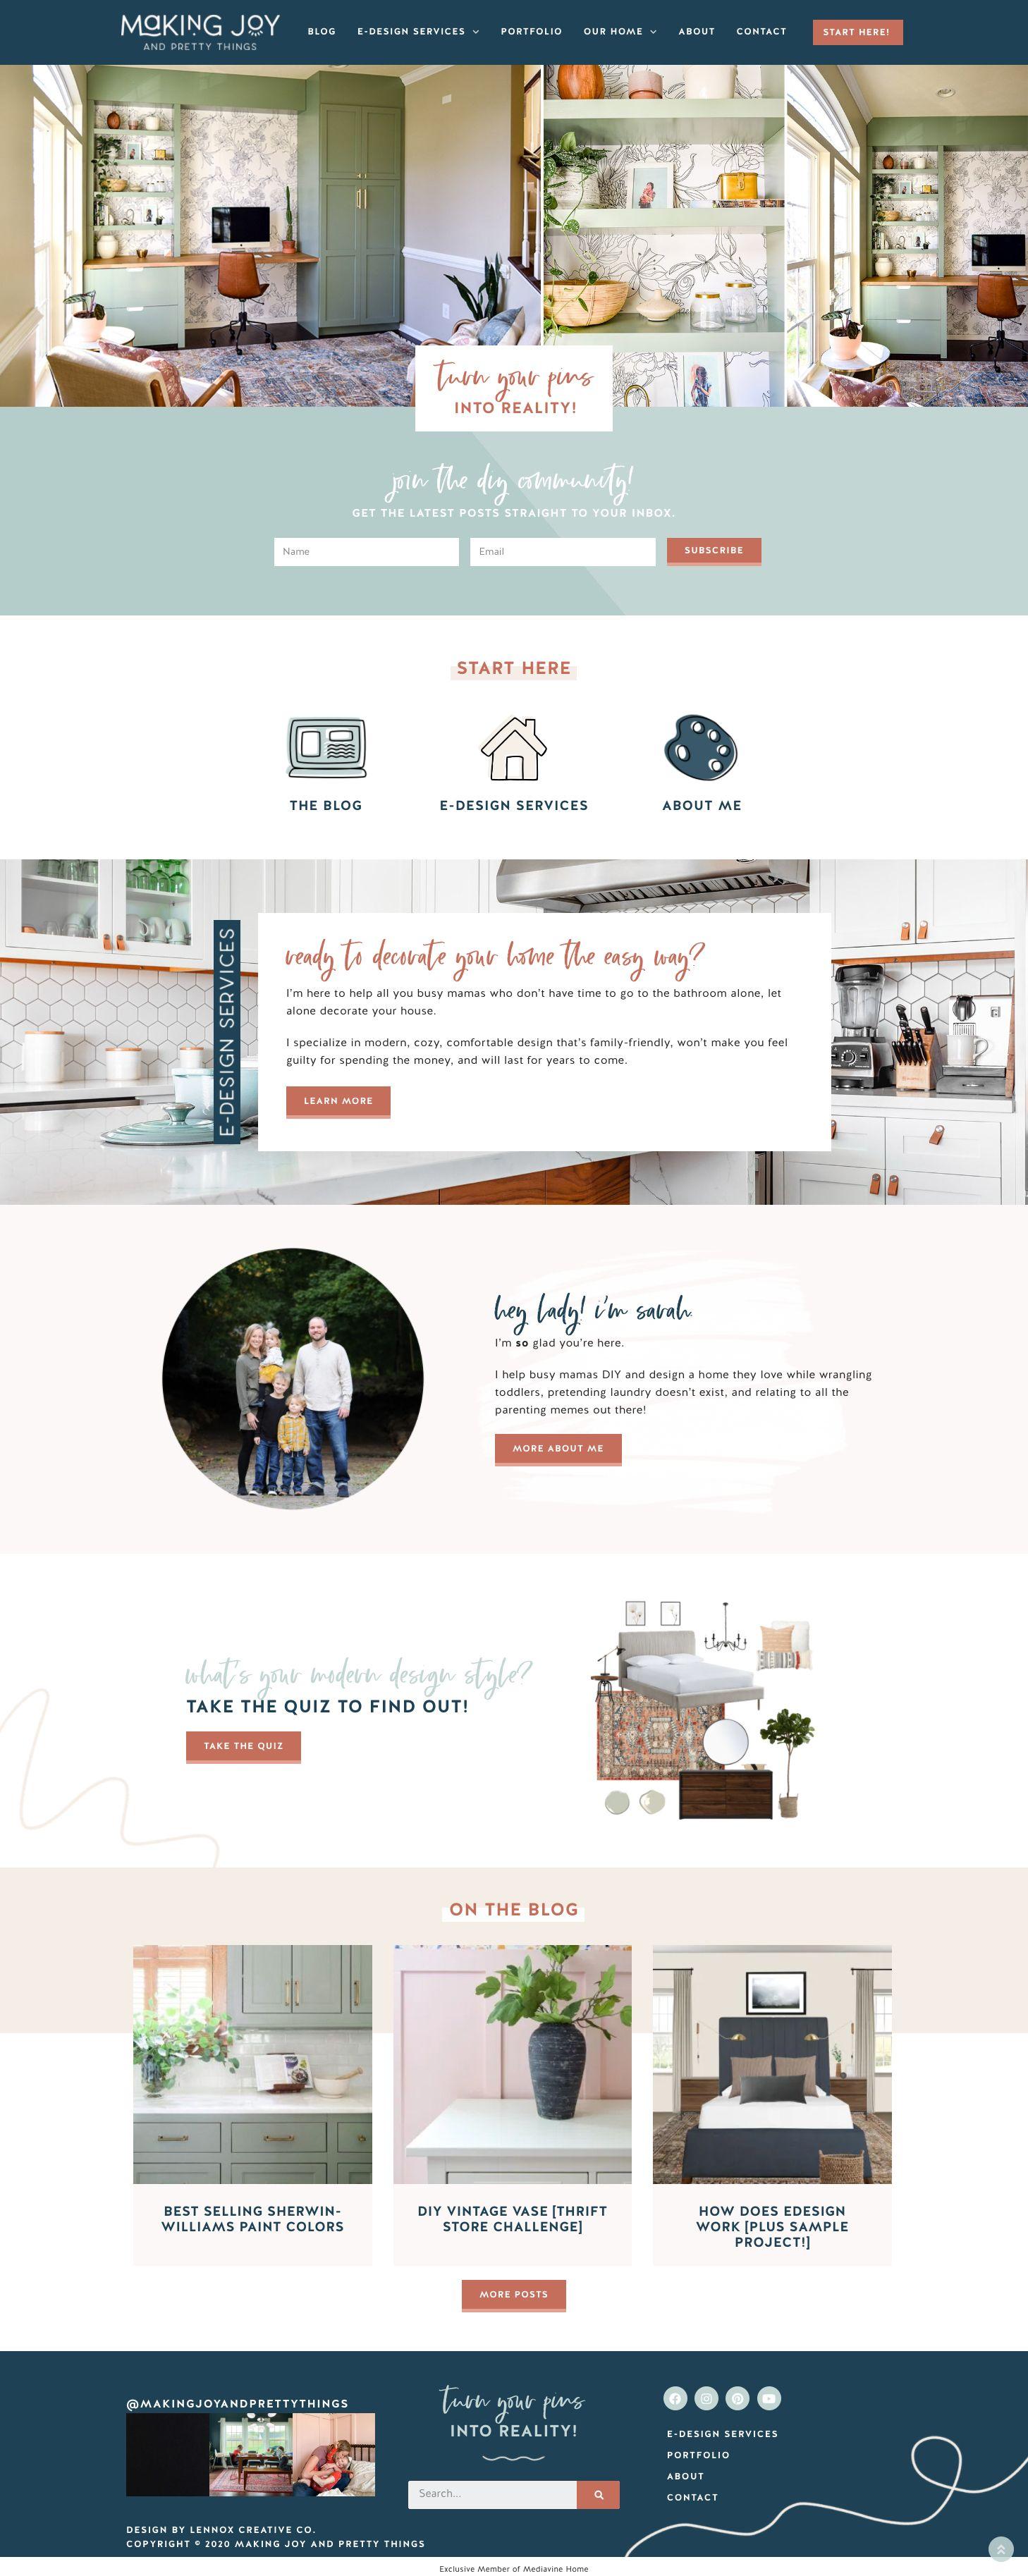 Interior Decorator Website Design In 2020 Website Design Web Design Interior Decorating